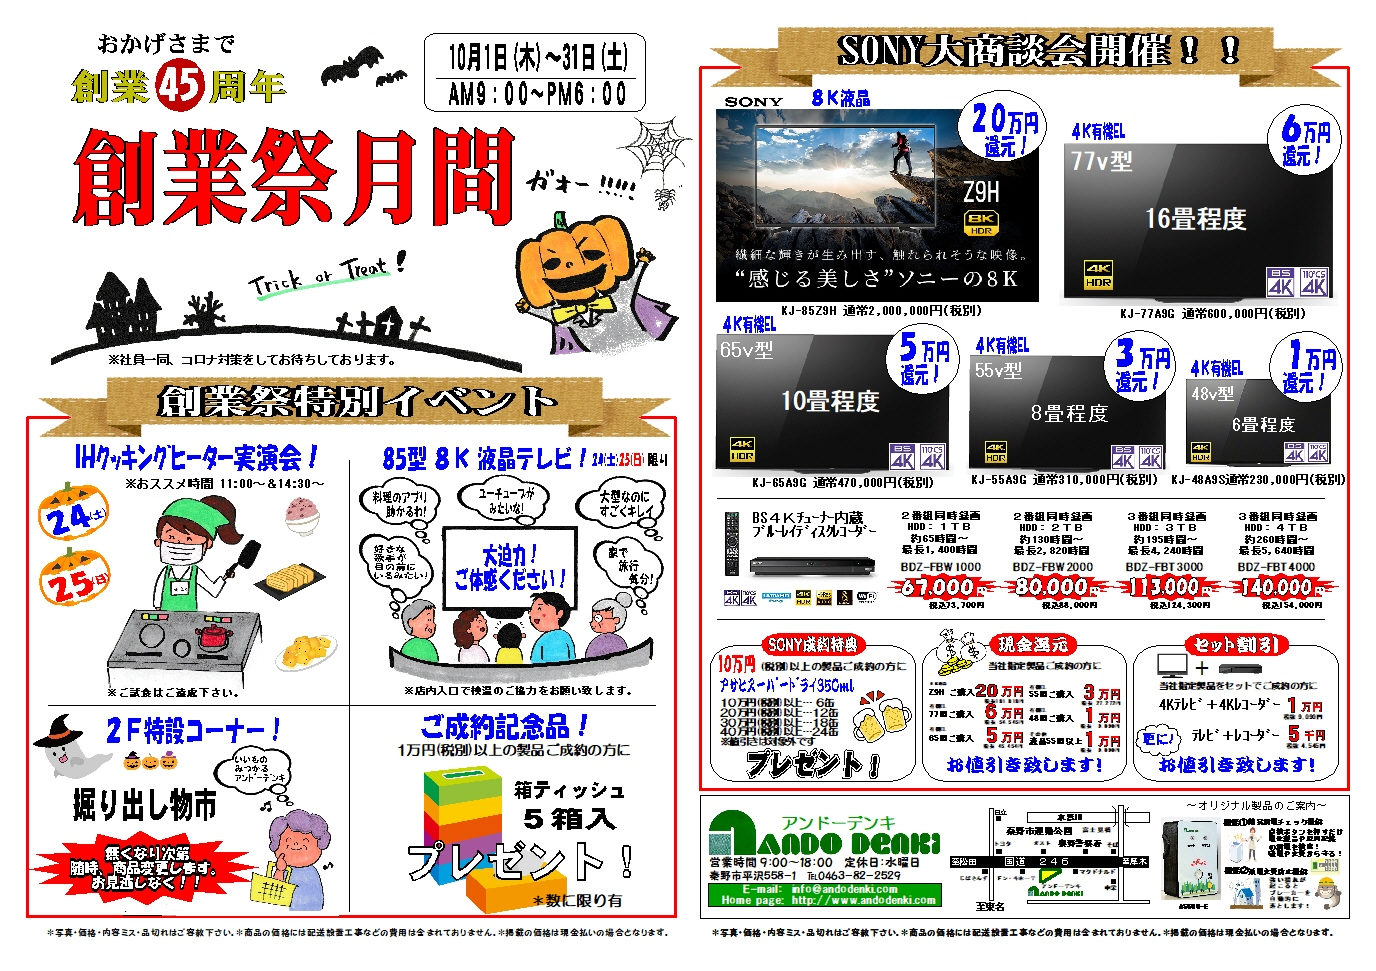 "NEW ""スマート""オールインワンPC   VAIO S15   ブラック展示中!!  開梱レポート掲載中!"